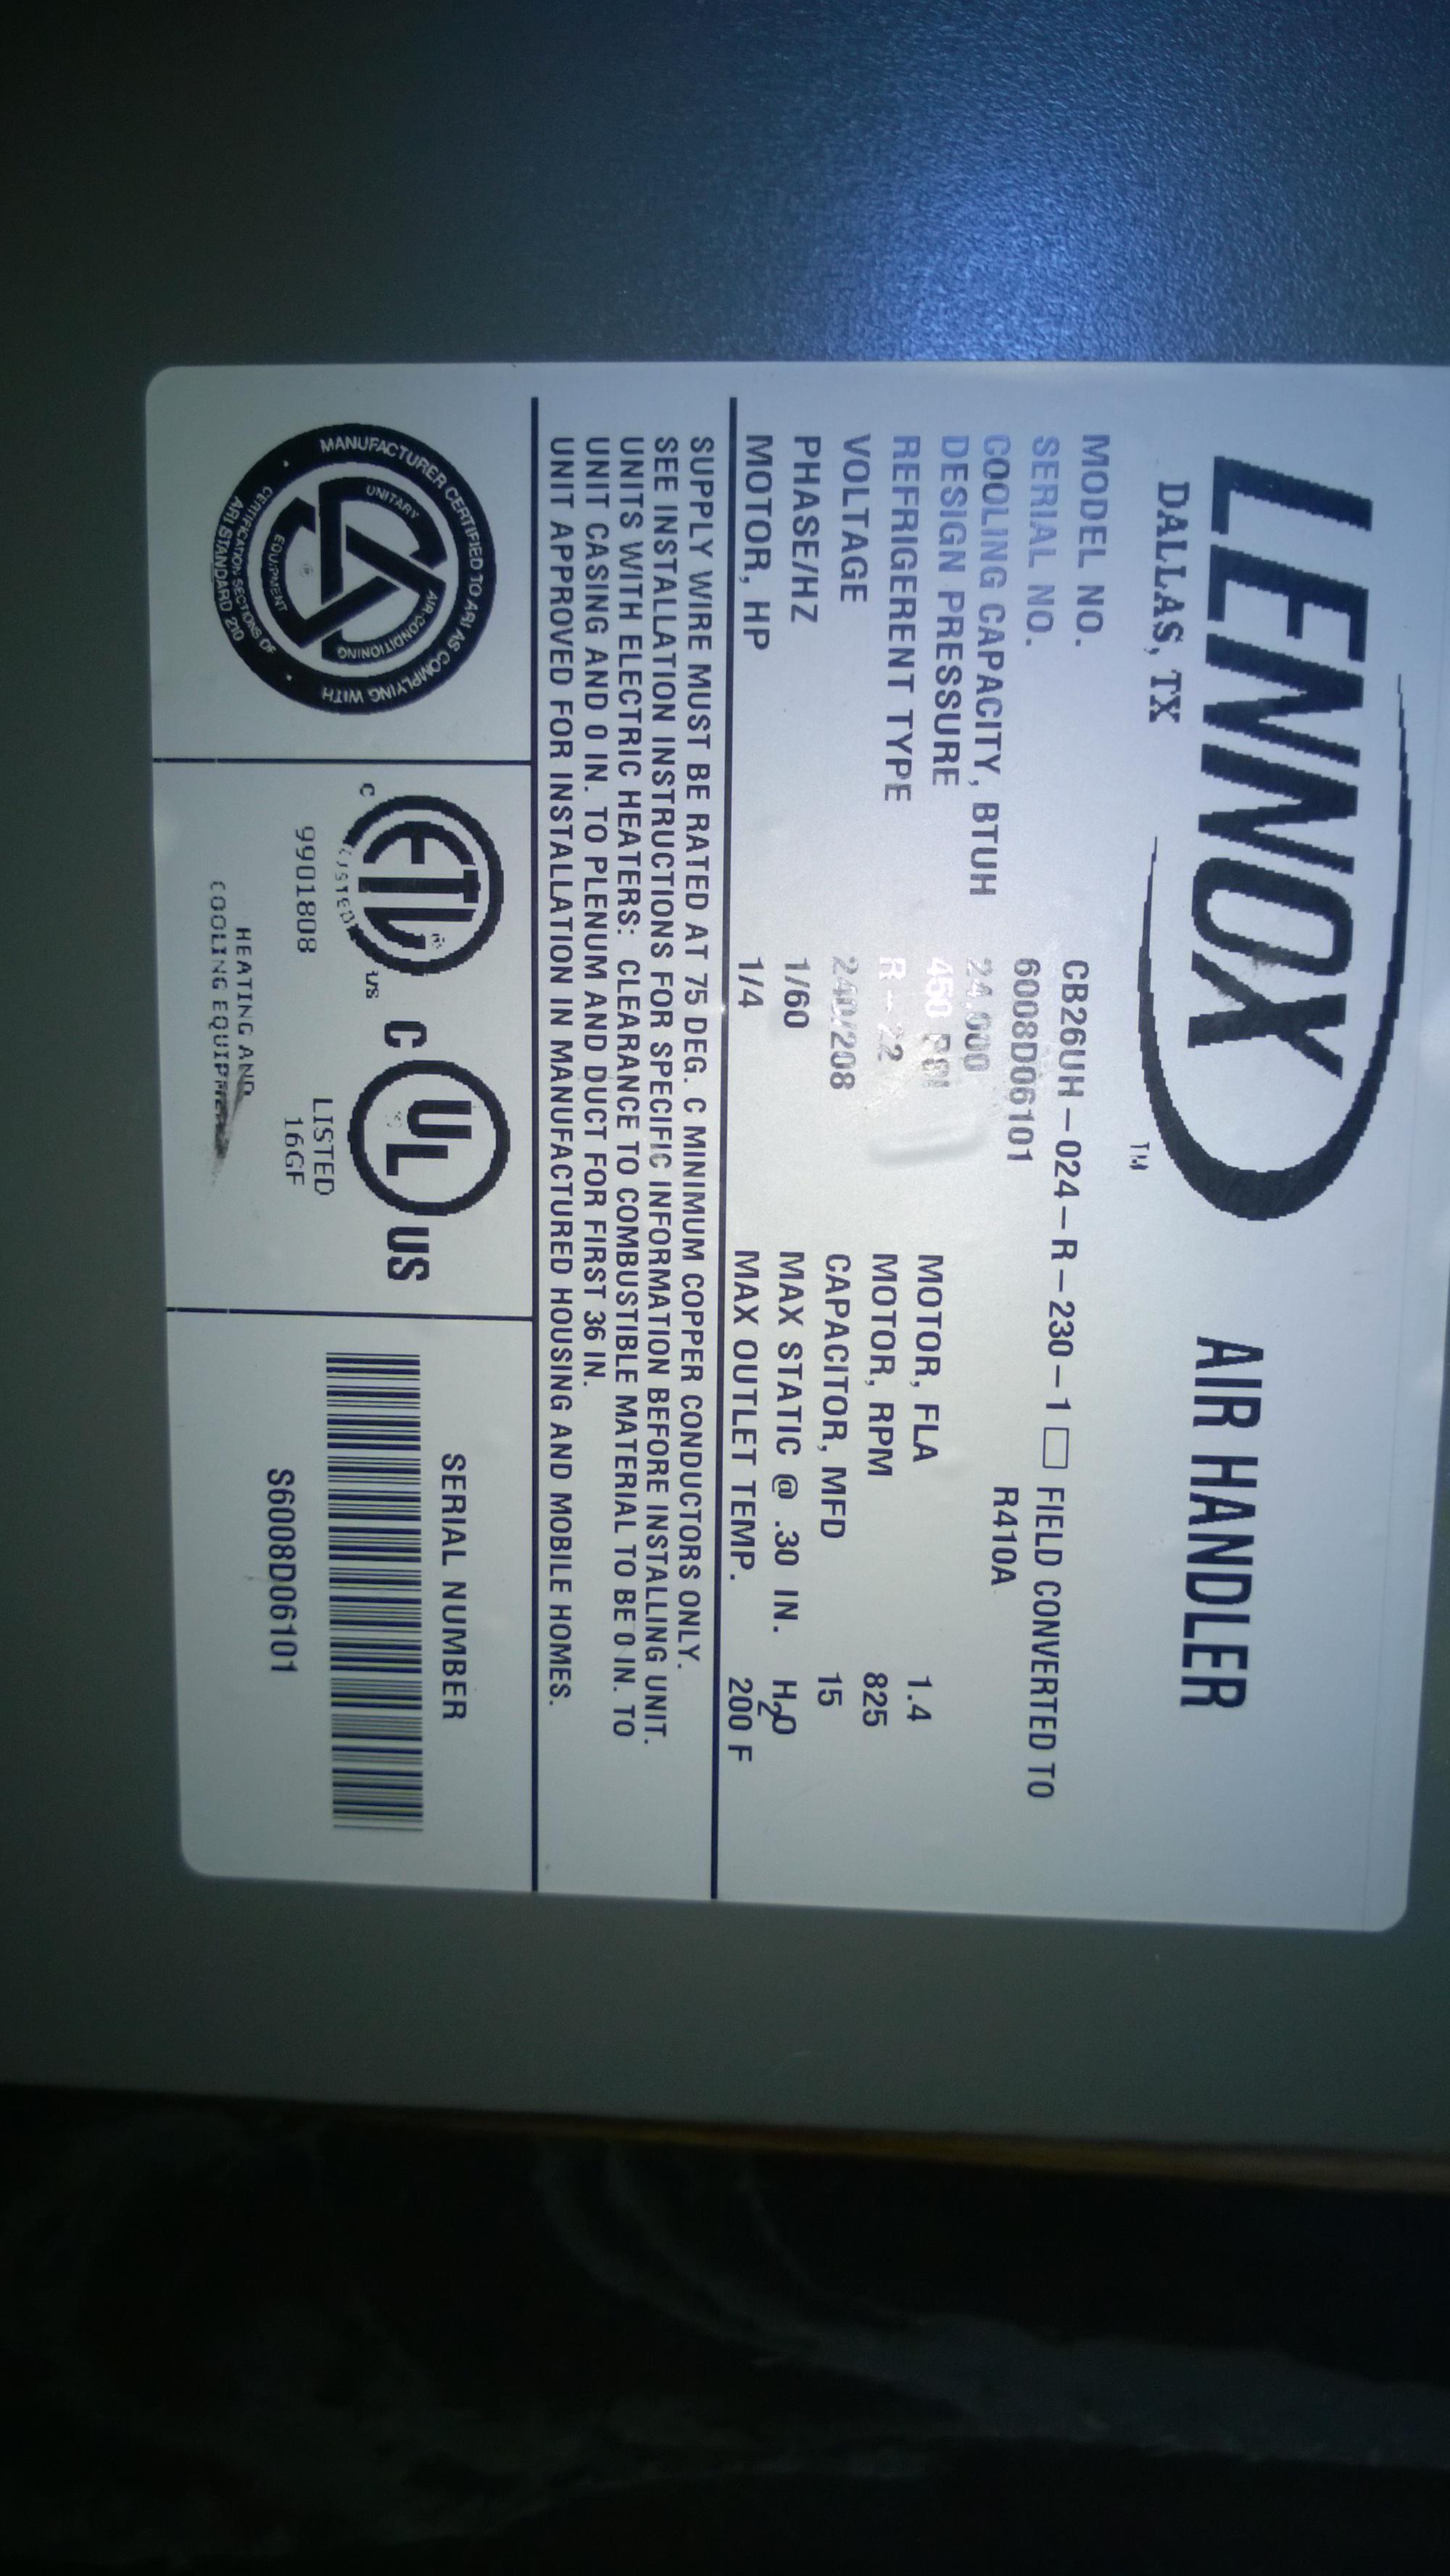 I Have A Lennox Heat Pump W Electrical Aux Emergency Approx Nordyne Thermostat 914832 Wiring Diagram Air Handler